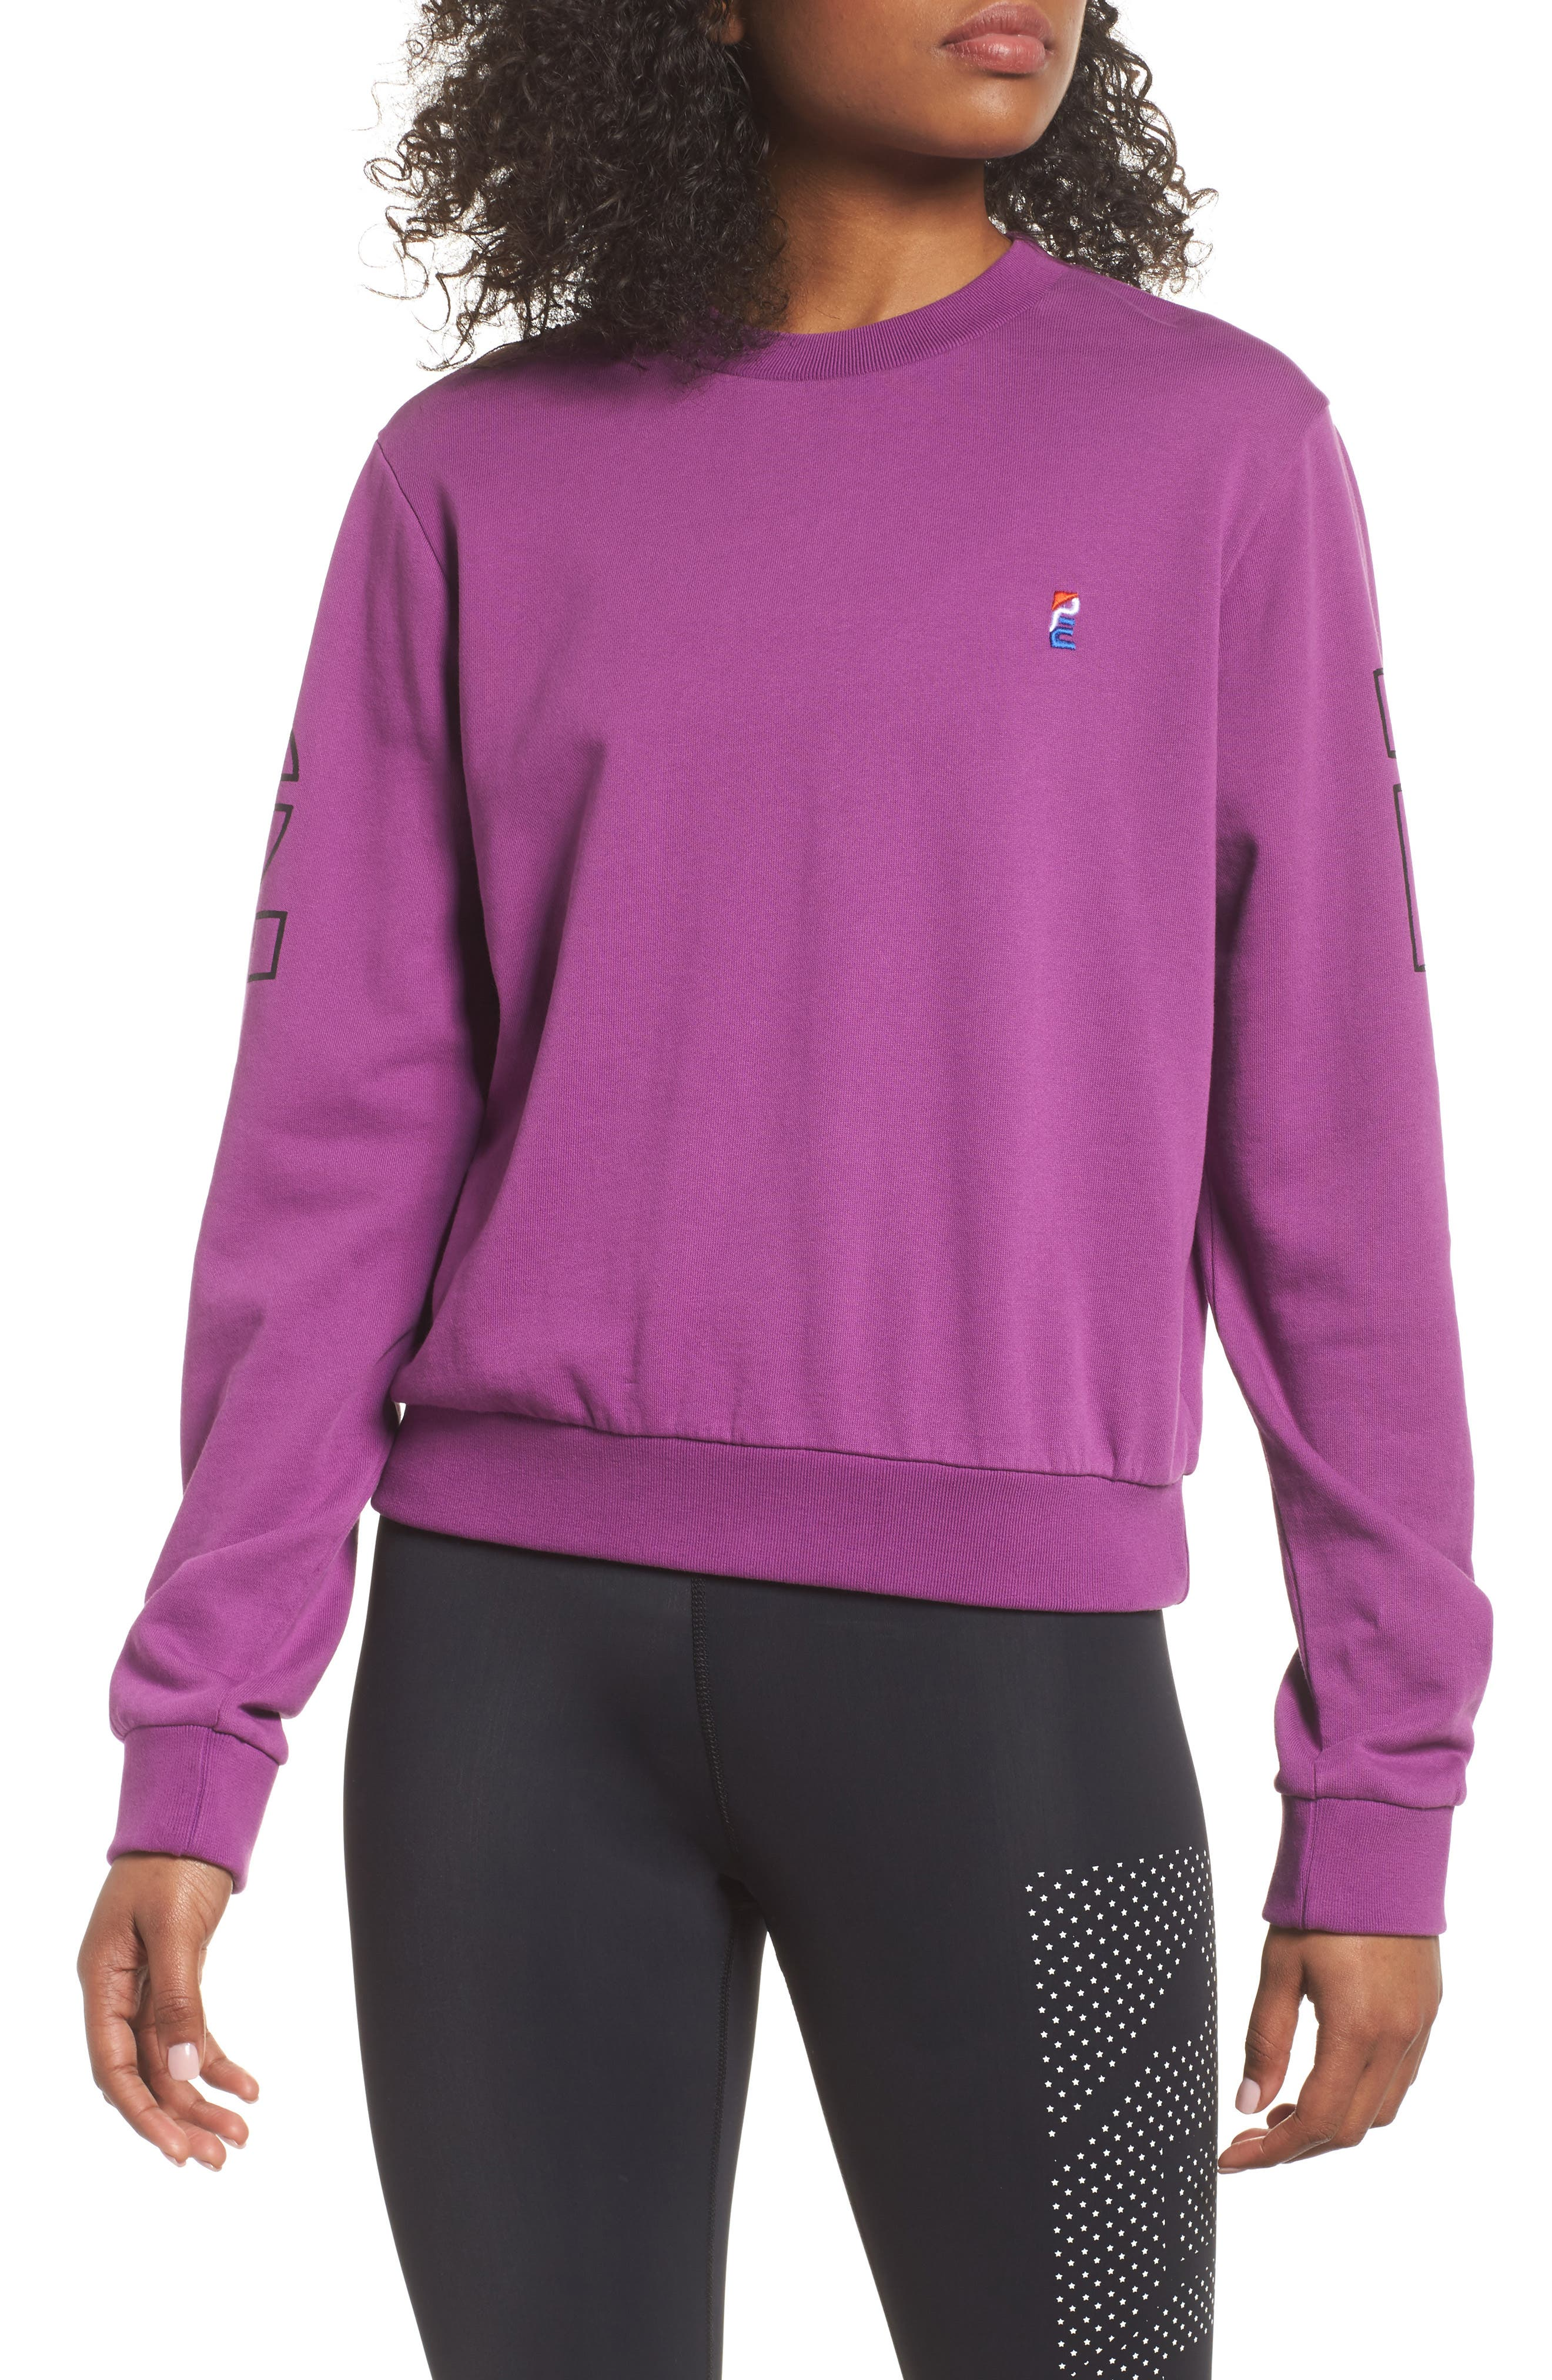 P.E Nation Moneyball Sweatshirt